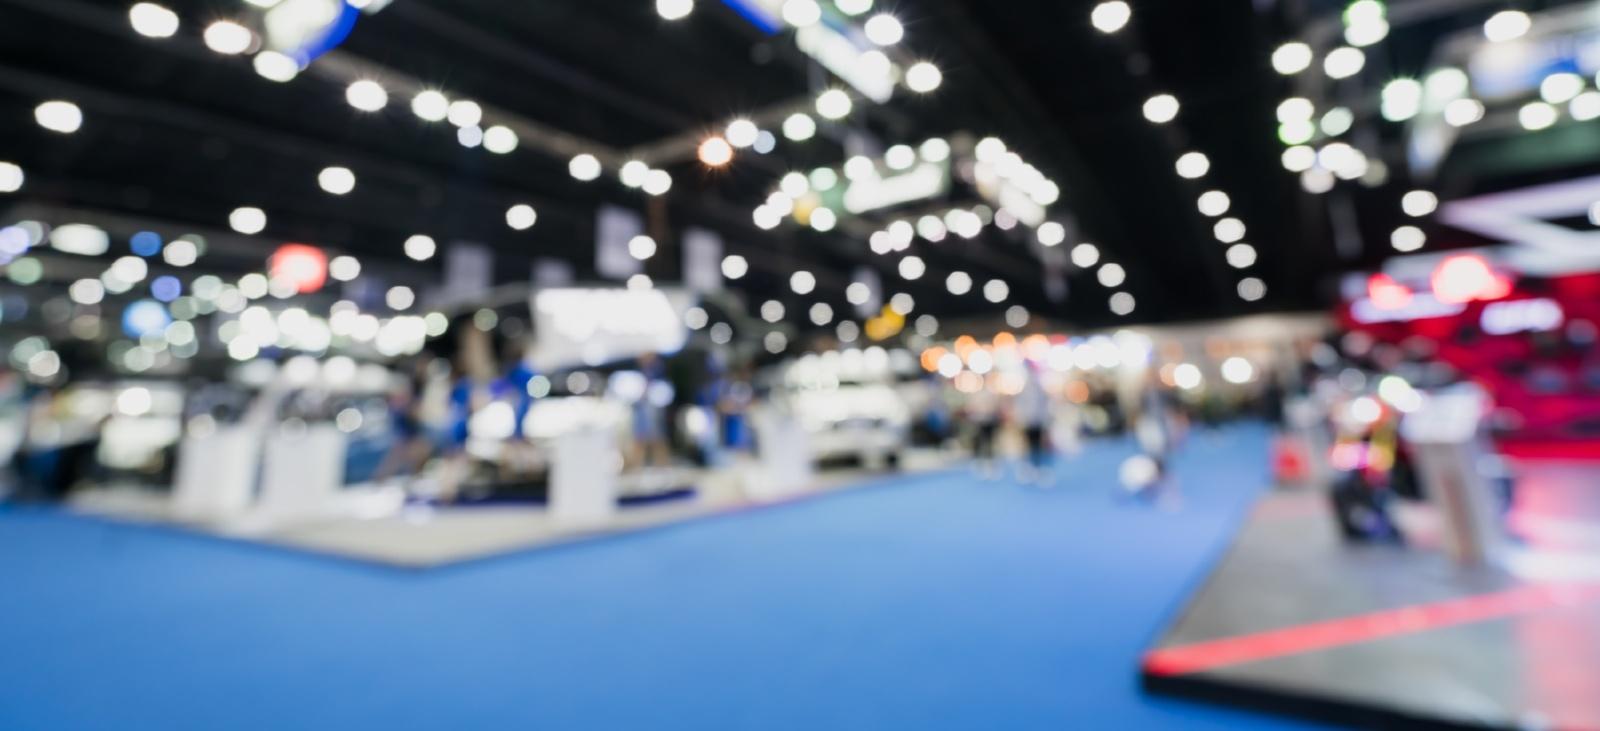 Education tradeshows with ESM Inbound